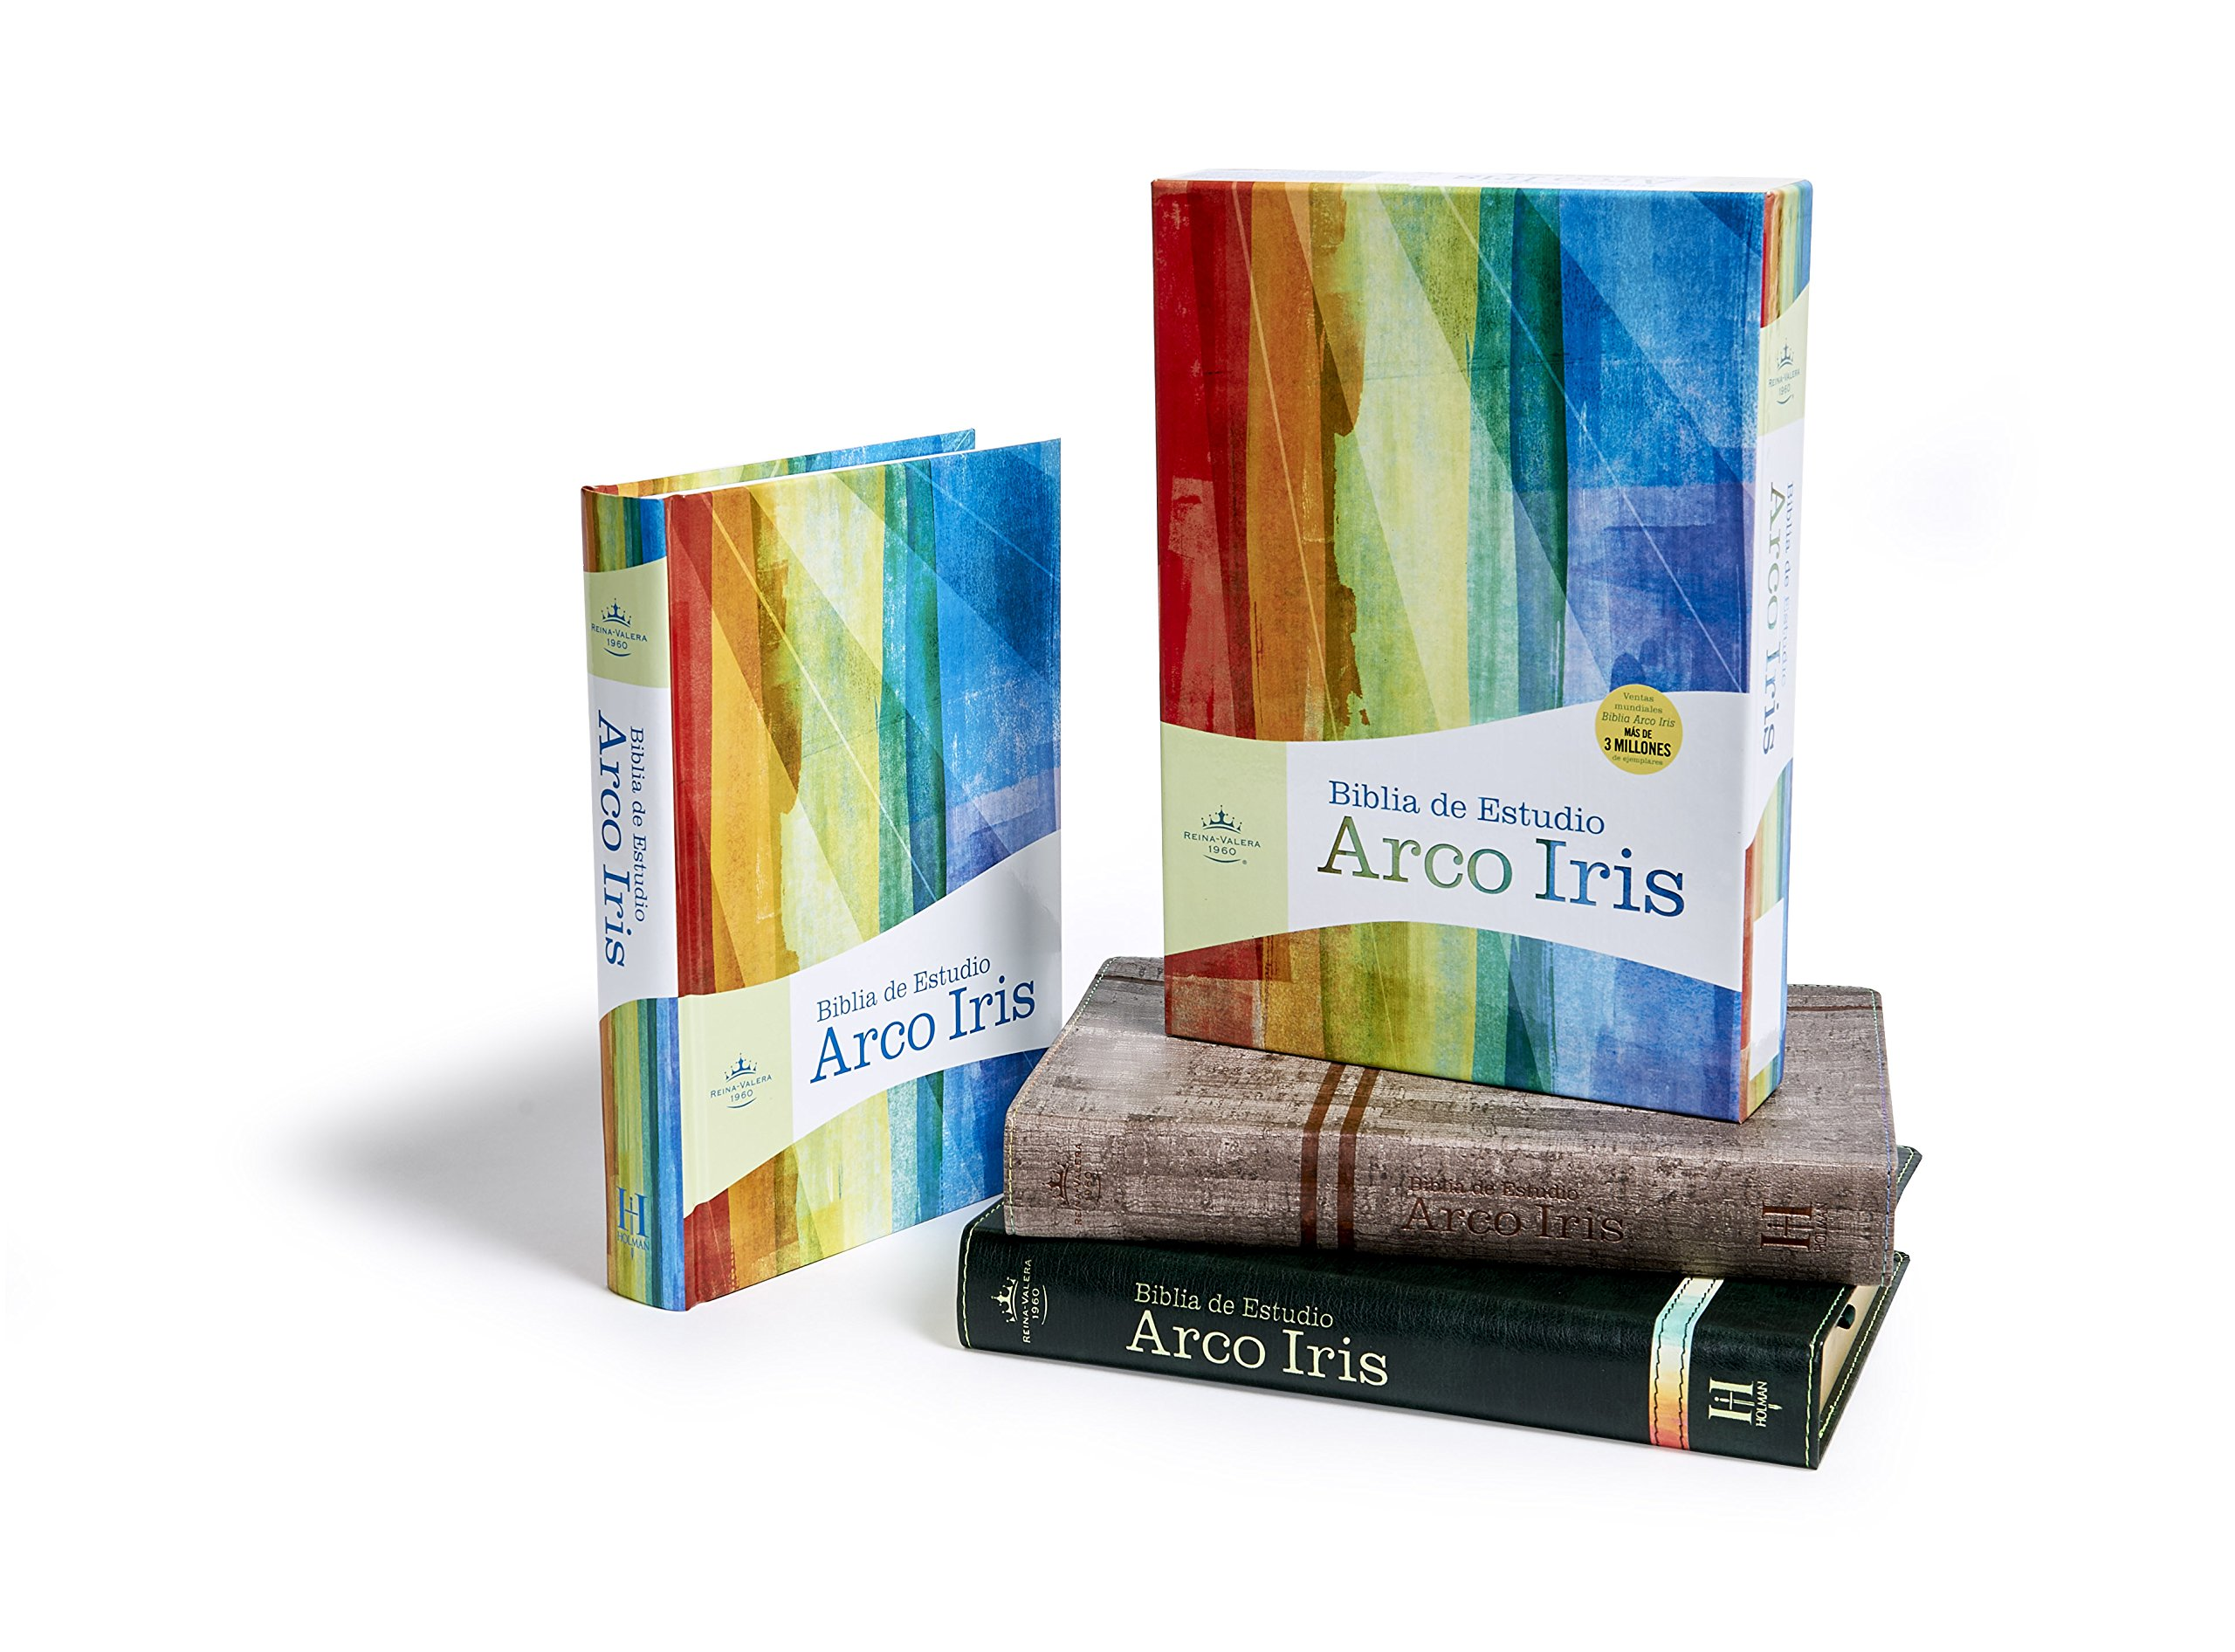 RVR 1960 Biblia de Estudio Arco Iris, gris pizarra/oliva ...